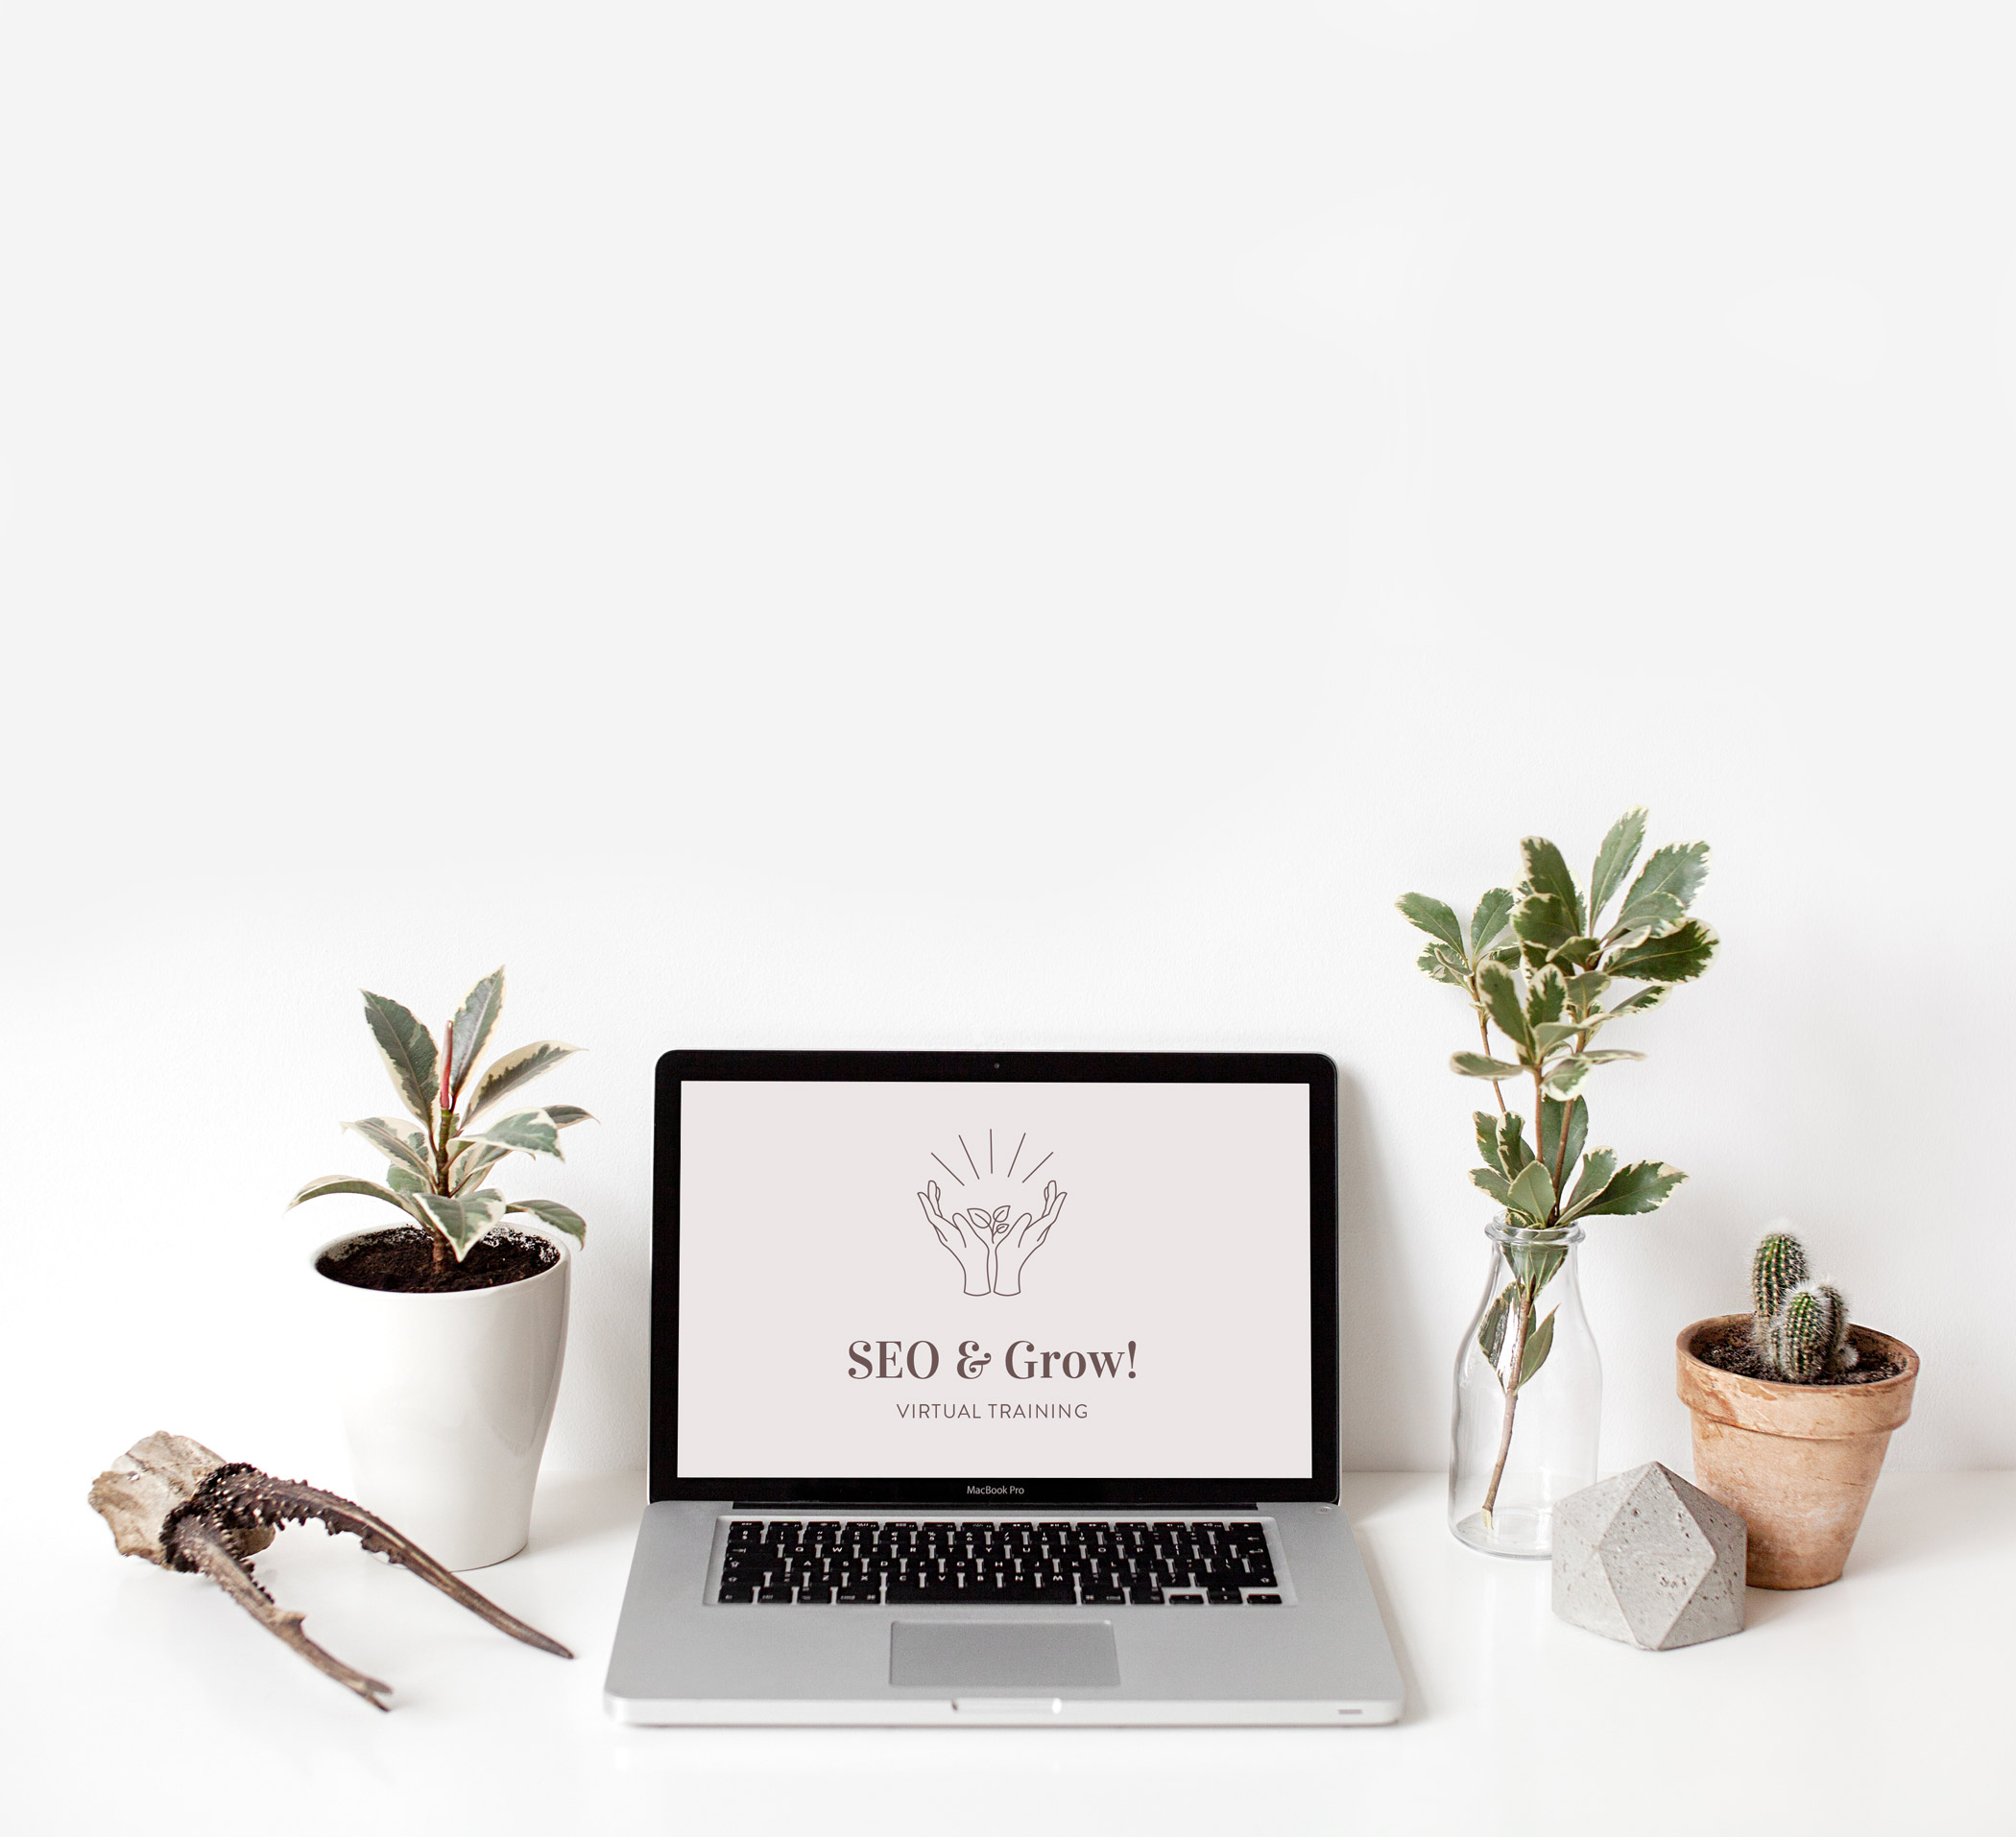 Small Business SEO Course - SEO & Grow!